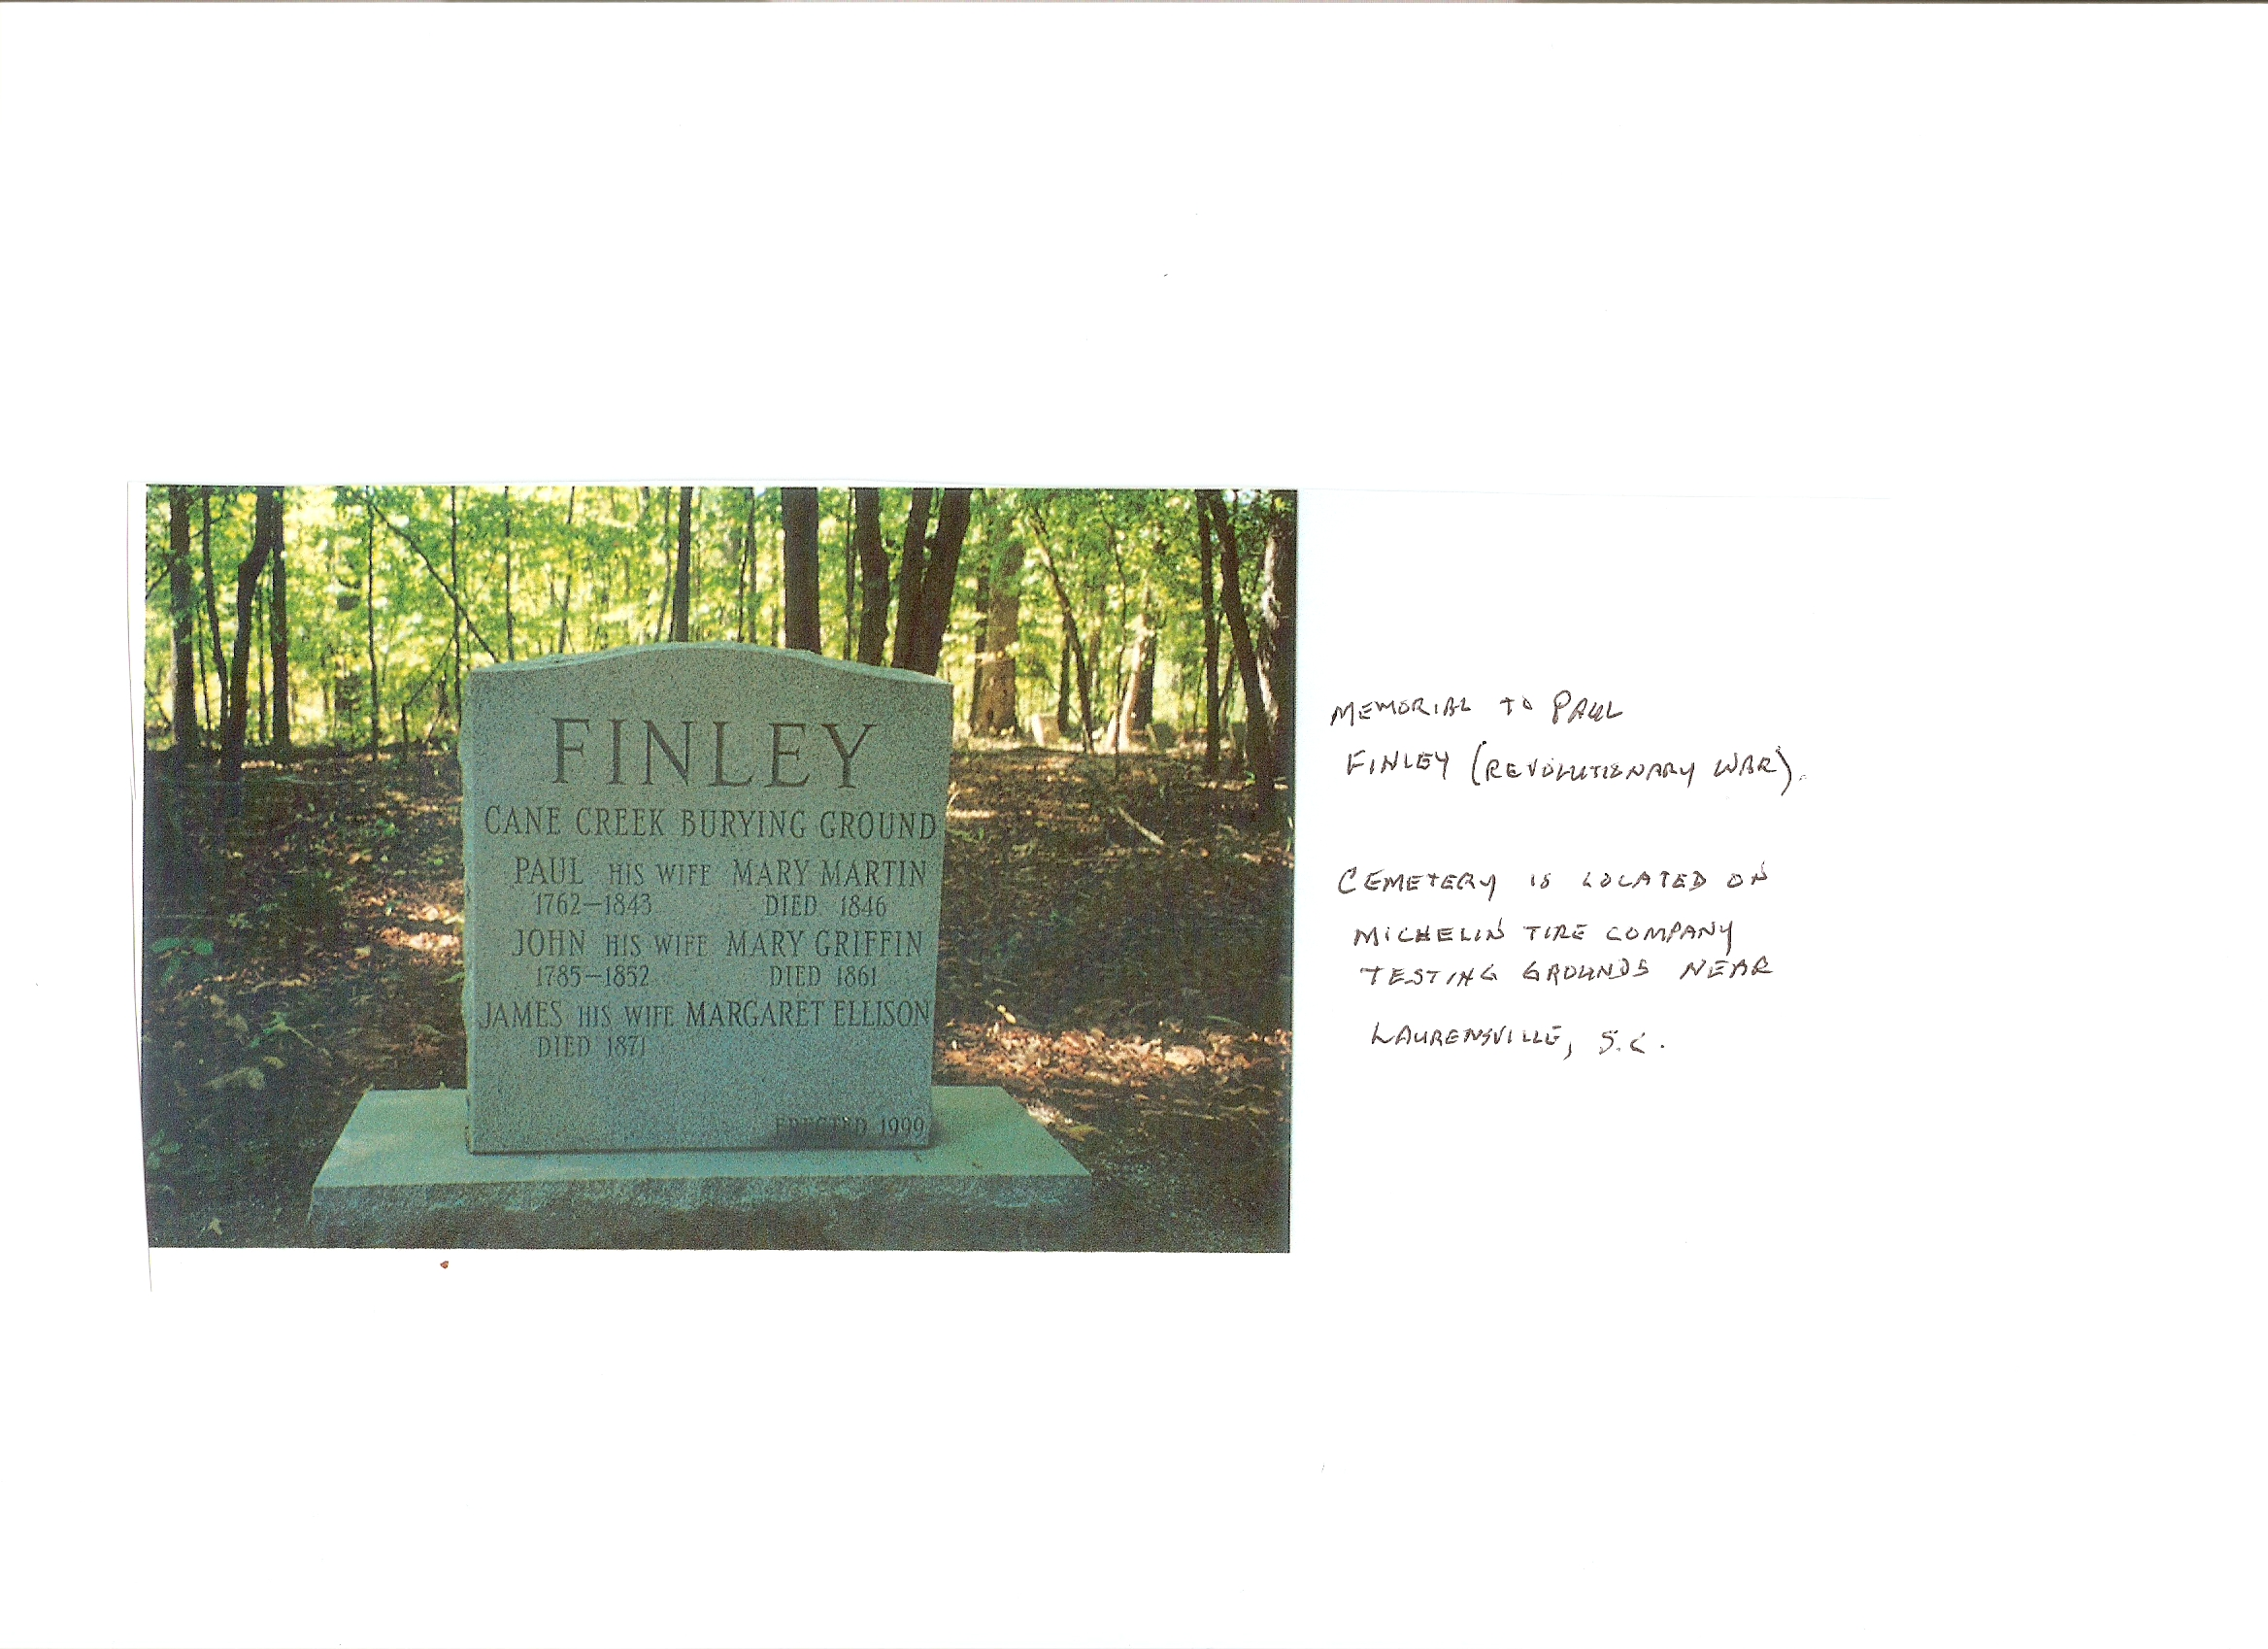 Mary Finley